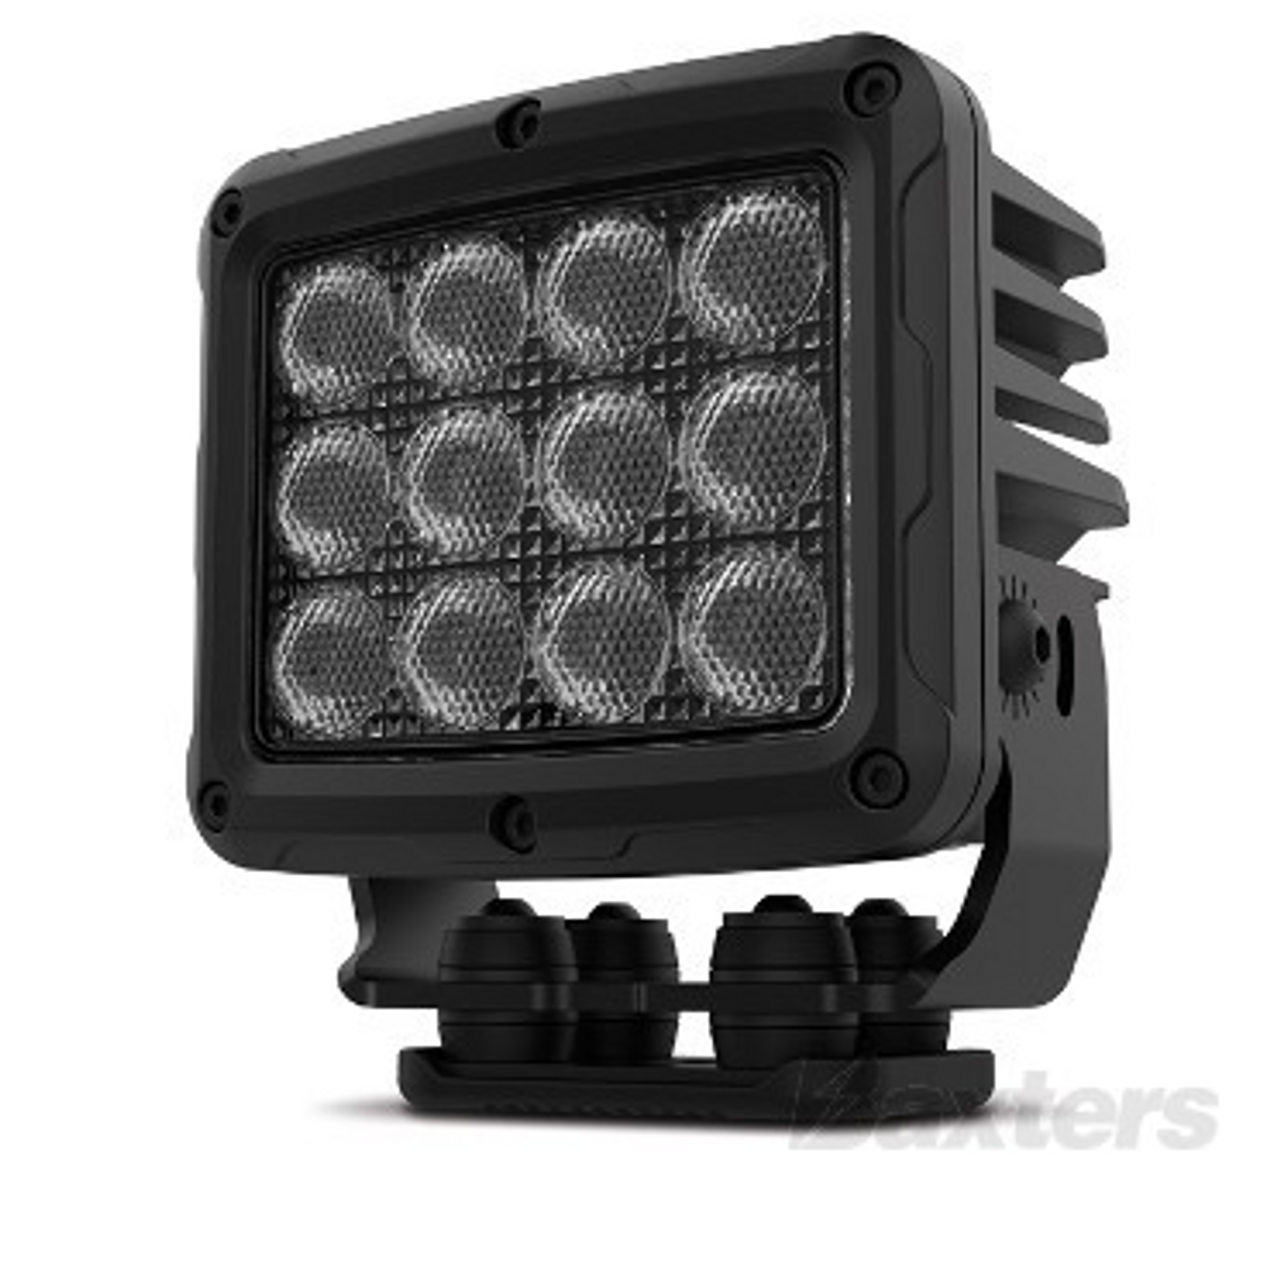 RWL5180F - Square 150 Watt LED Flood Beam Work Light. 150 Watt. Multi-Volt 10v to 30 Volt DC. 5 Year Warranty.  Flood Beam 150 watts, 12000Lm. great Work Light. Roadvision. Ultimate LED.